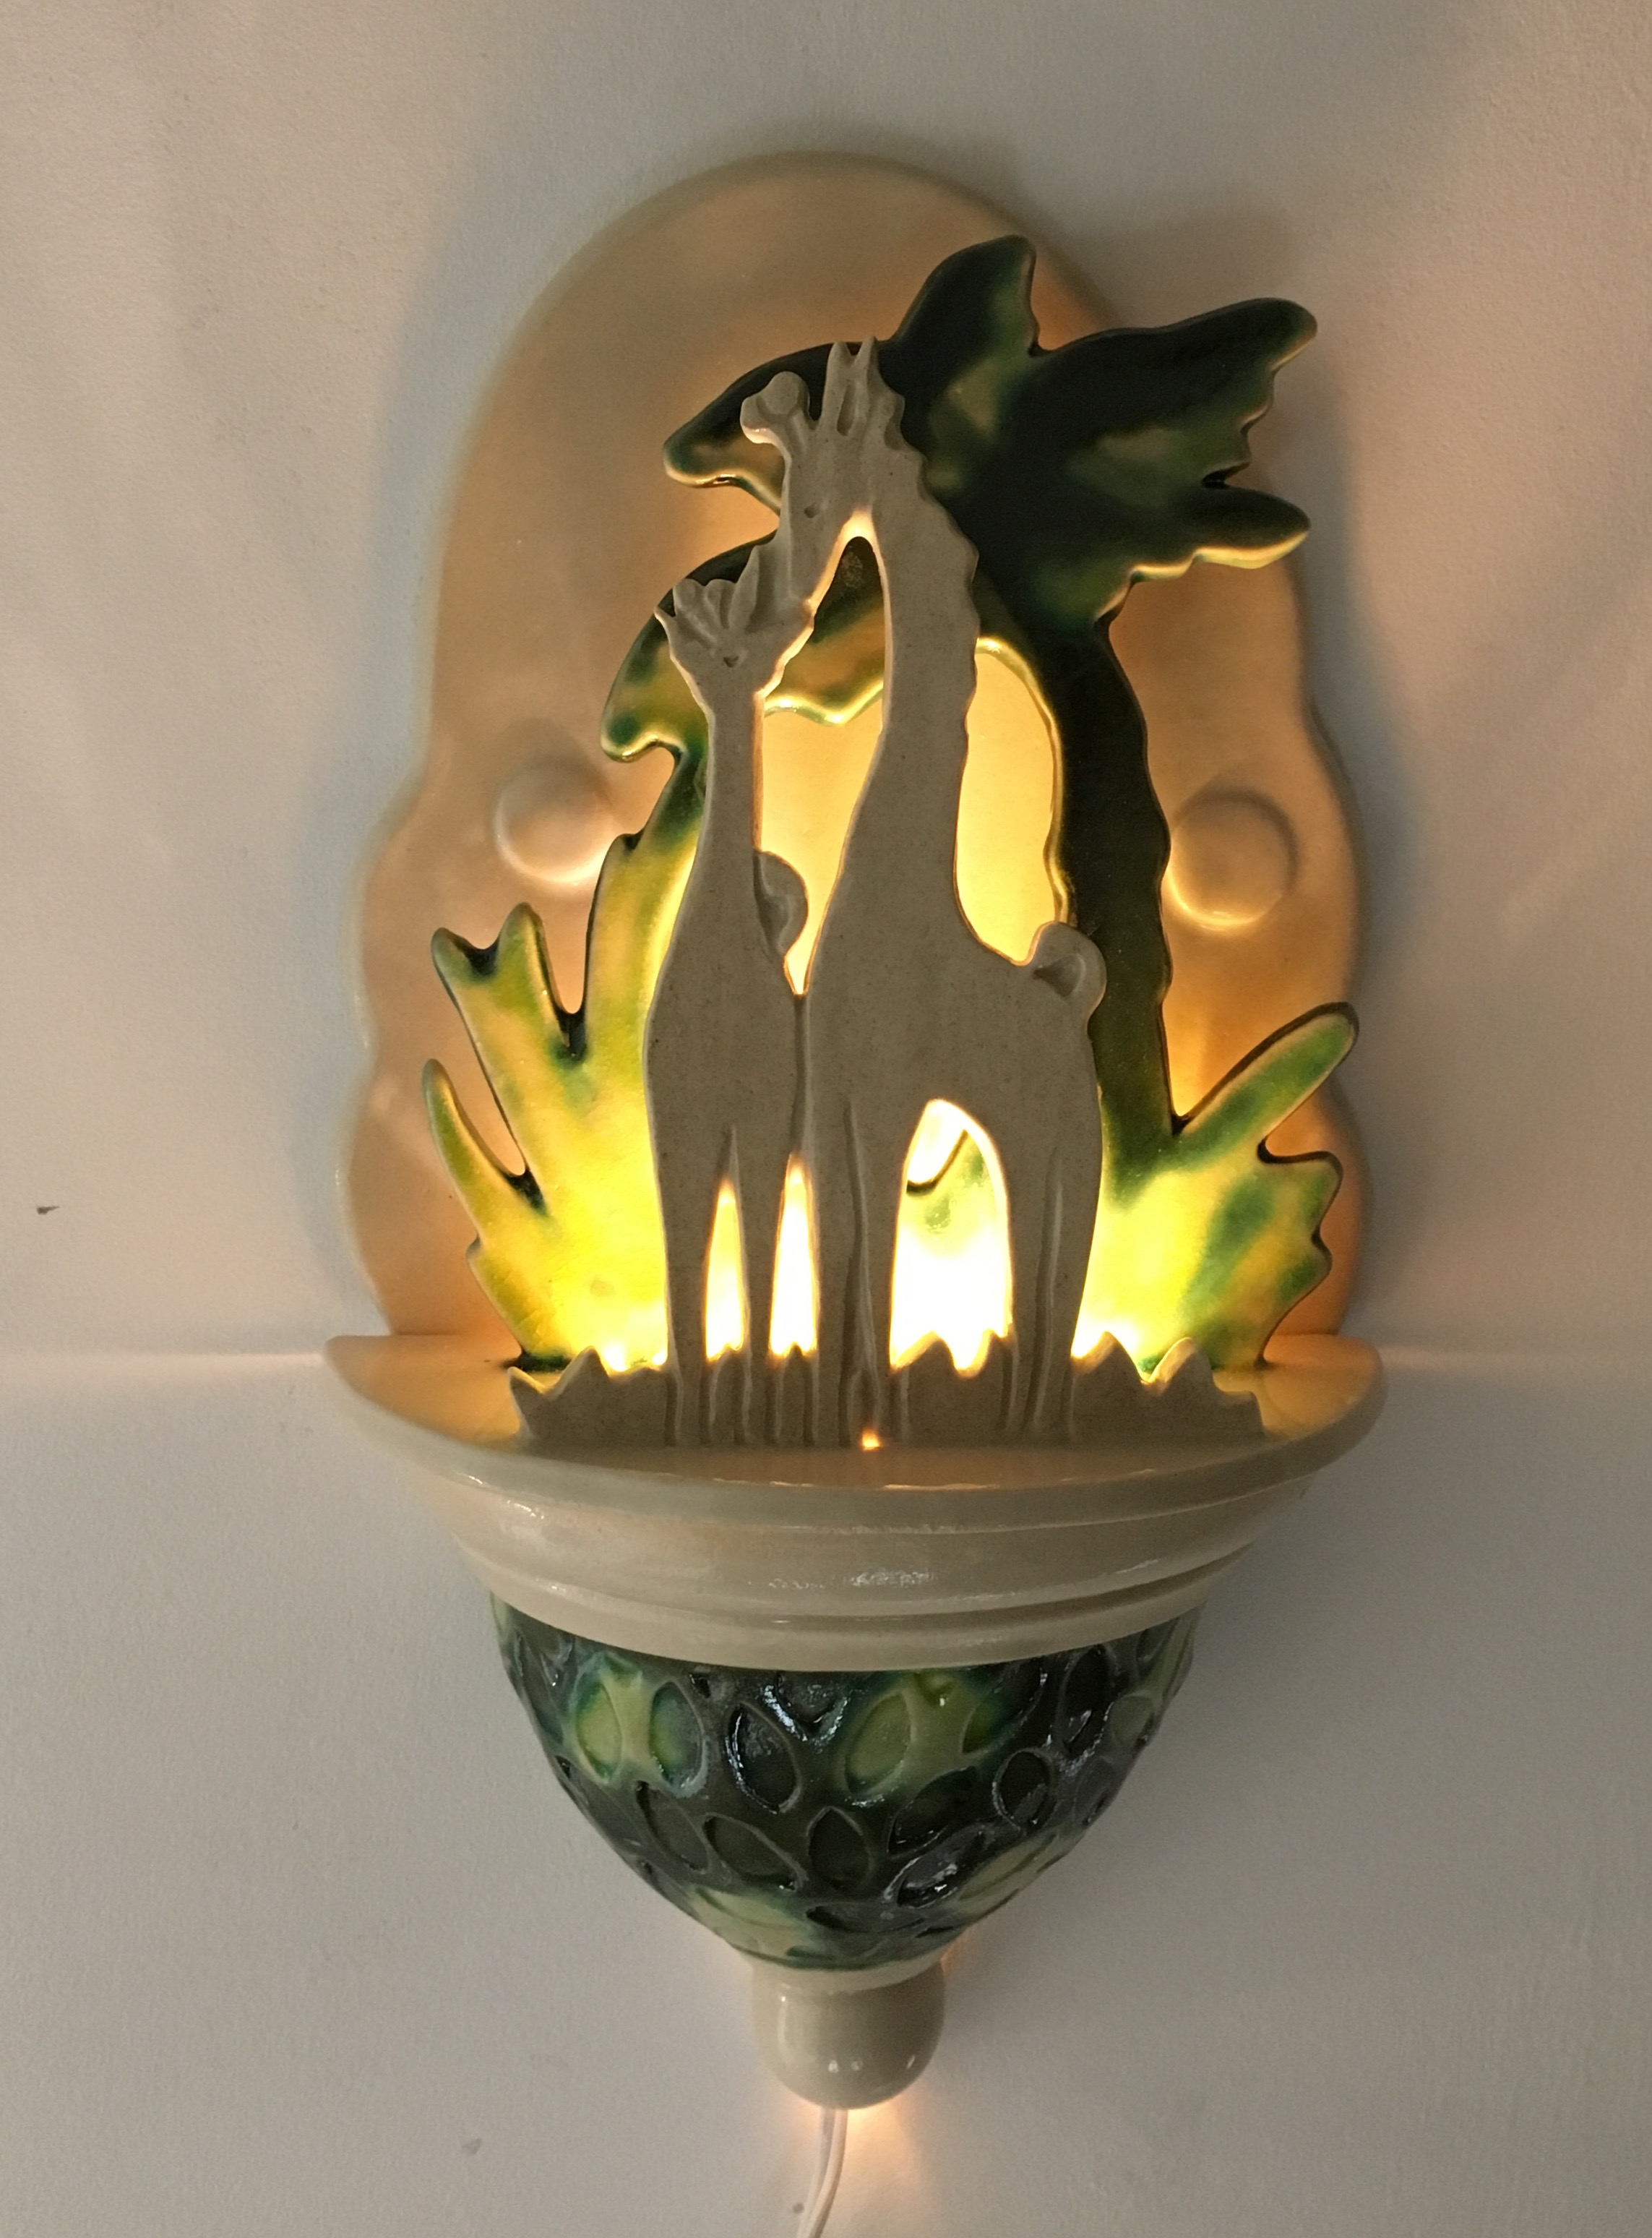 Olivia's lamp